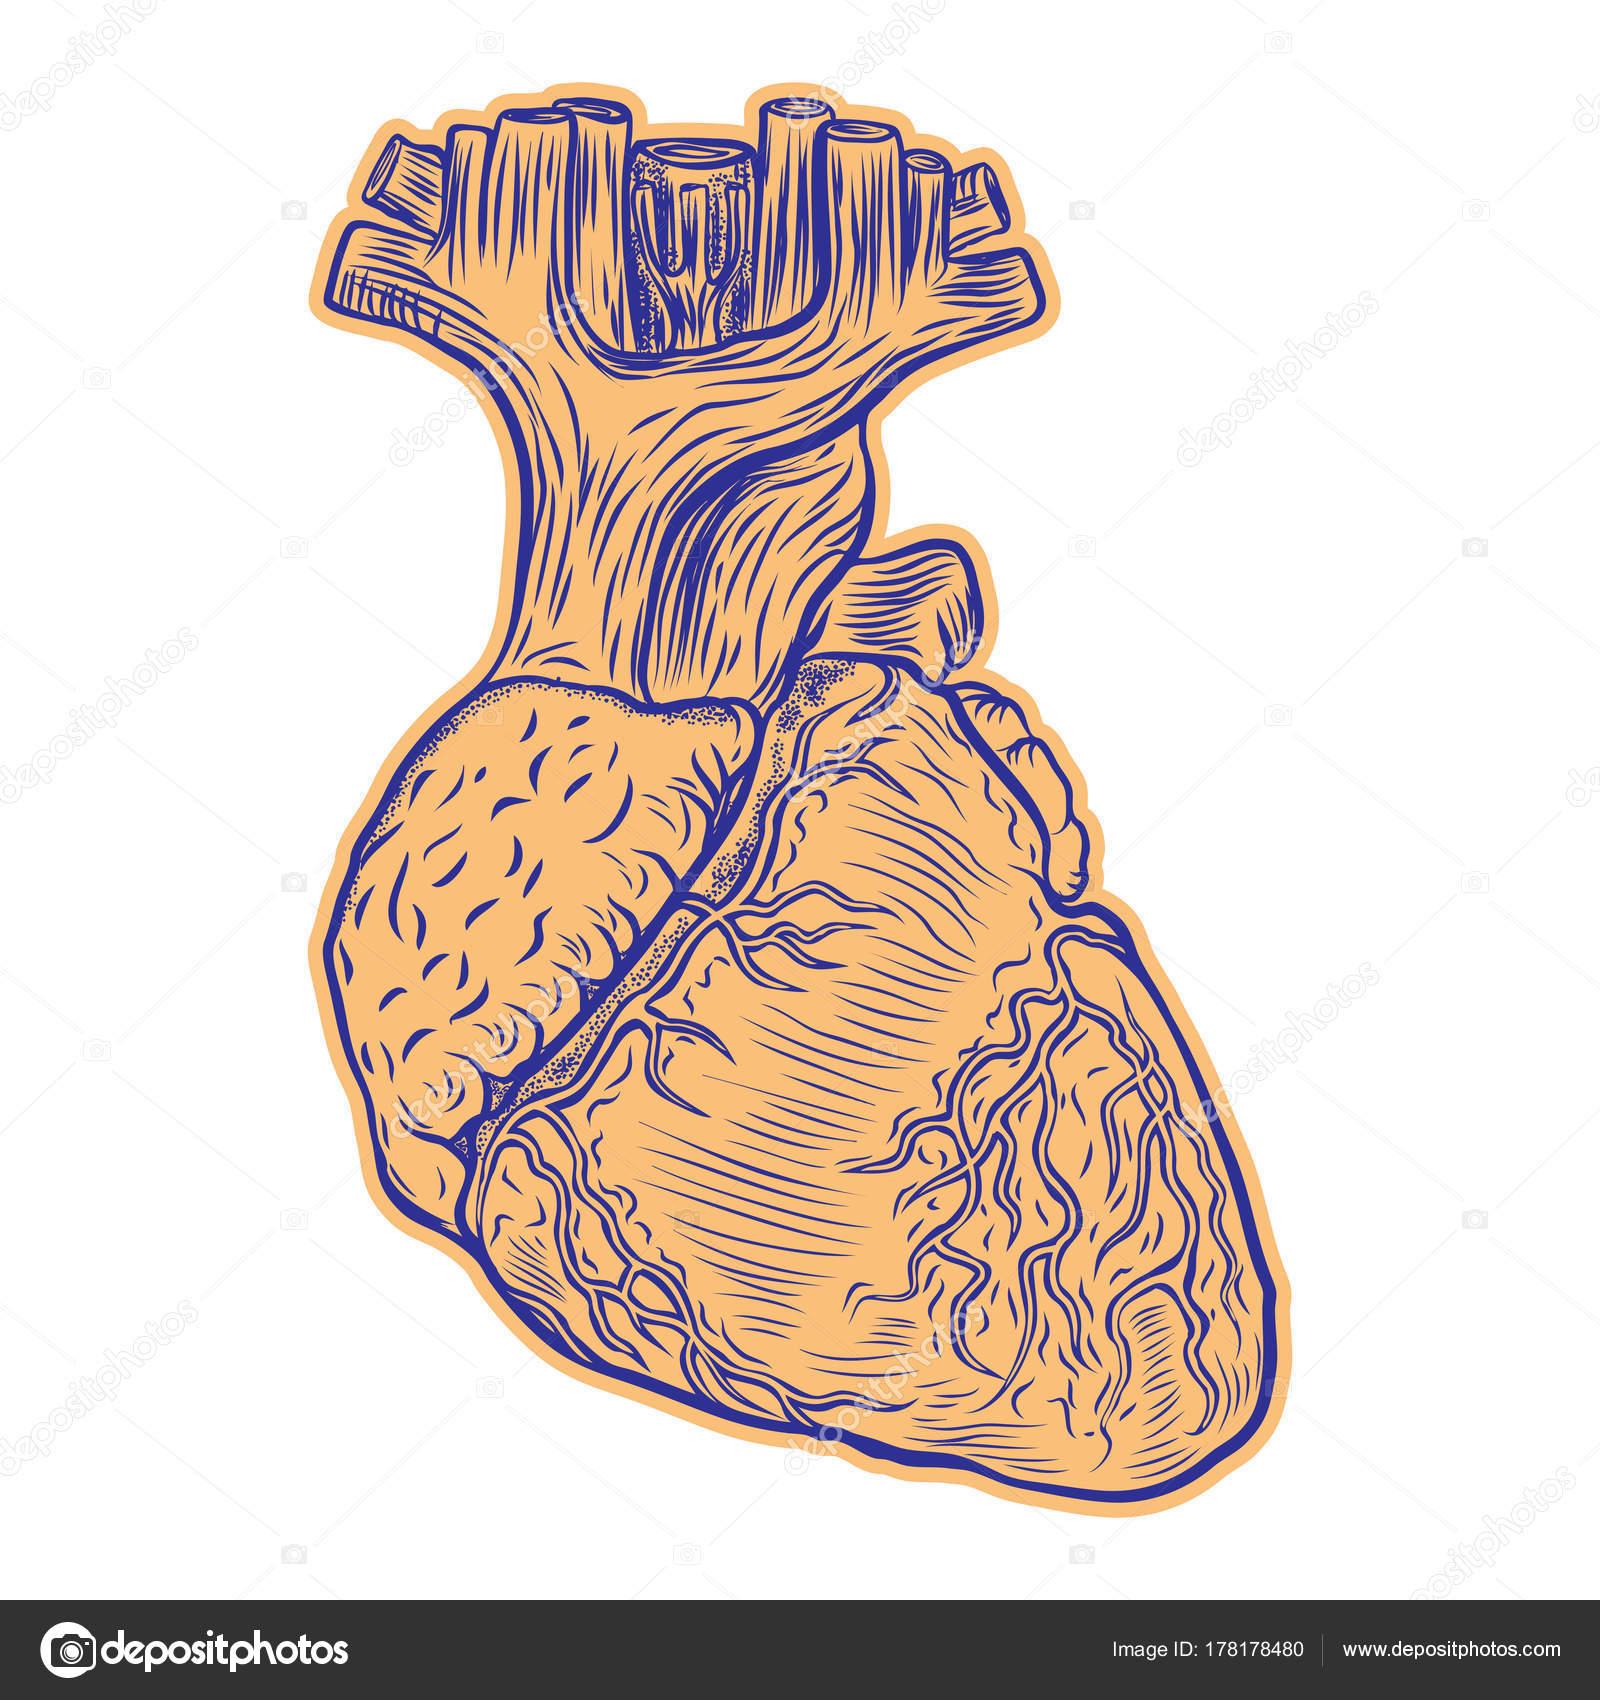 Dibujo Del Corazón Realista Corazón Humano Realista Dibujo